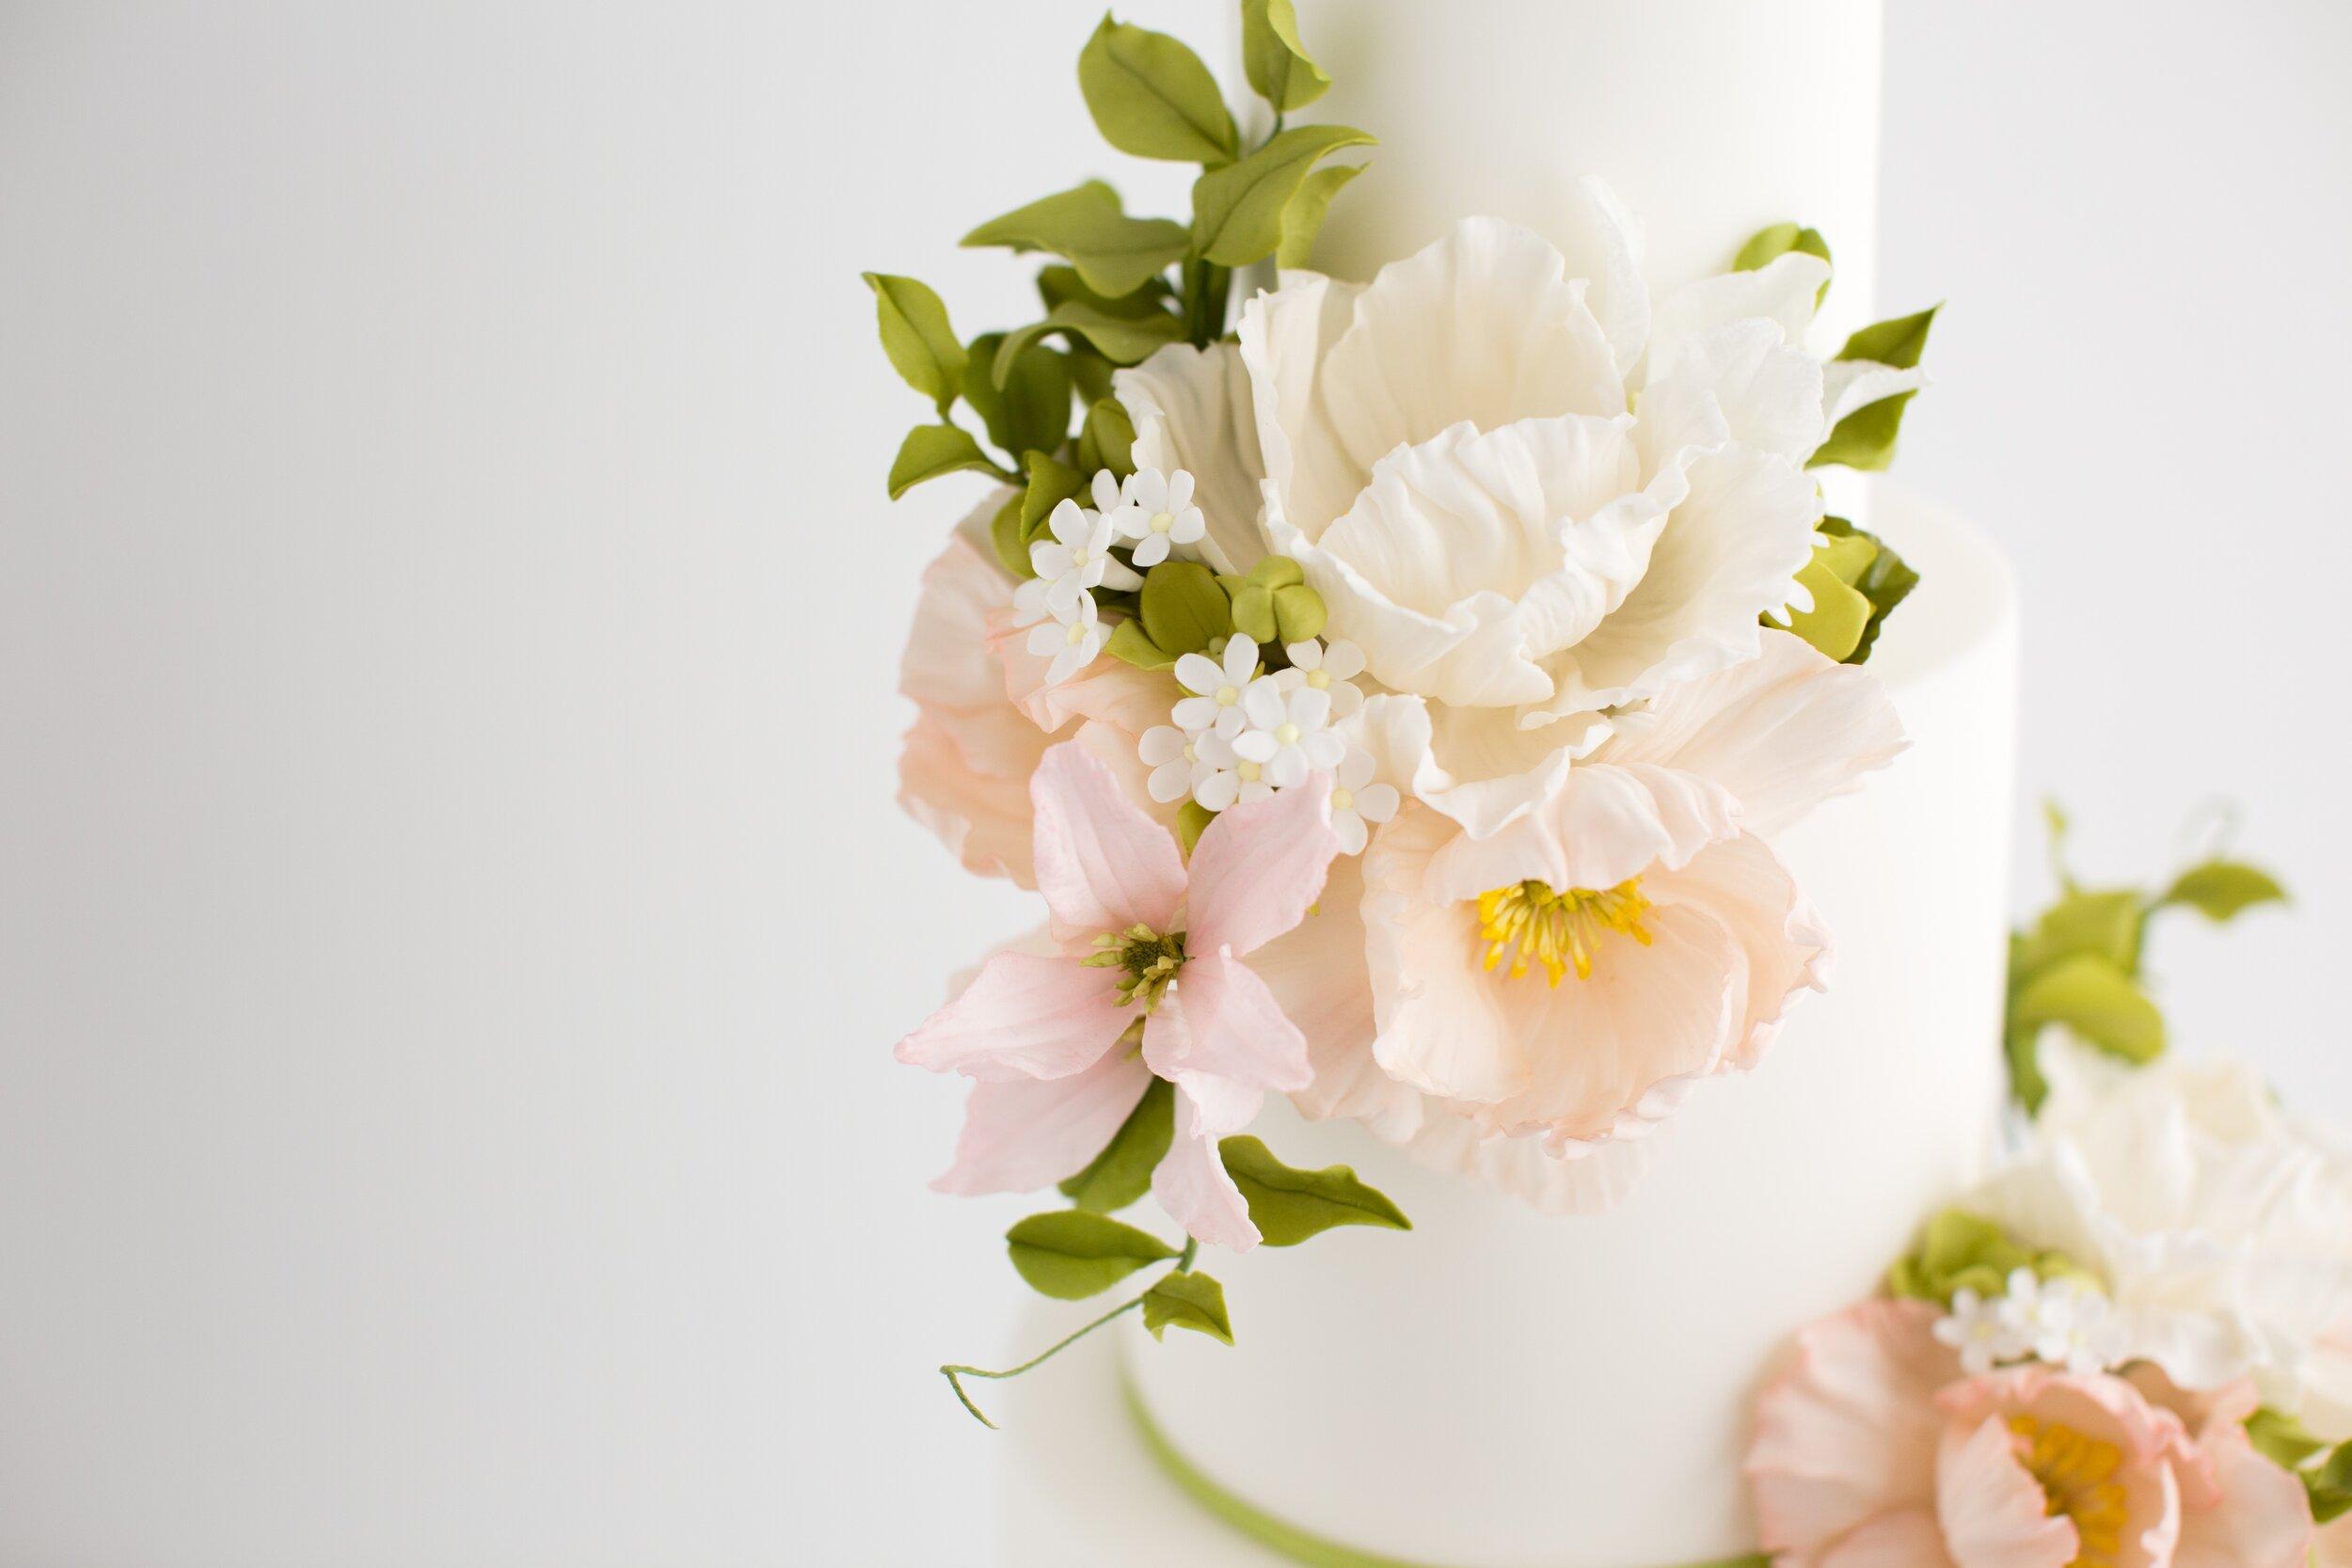 MSFII-Cake-PoppyCake-Beauty-0030-2 (2).jpg